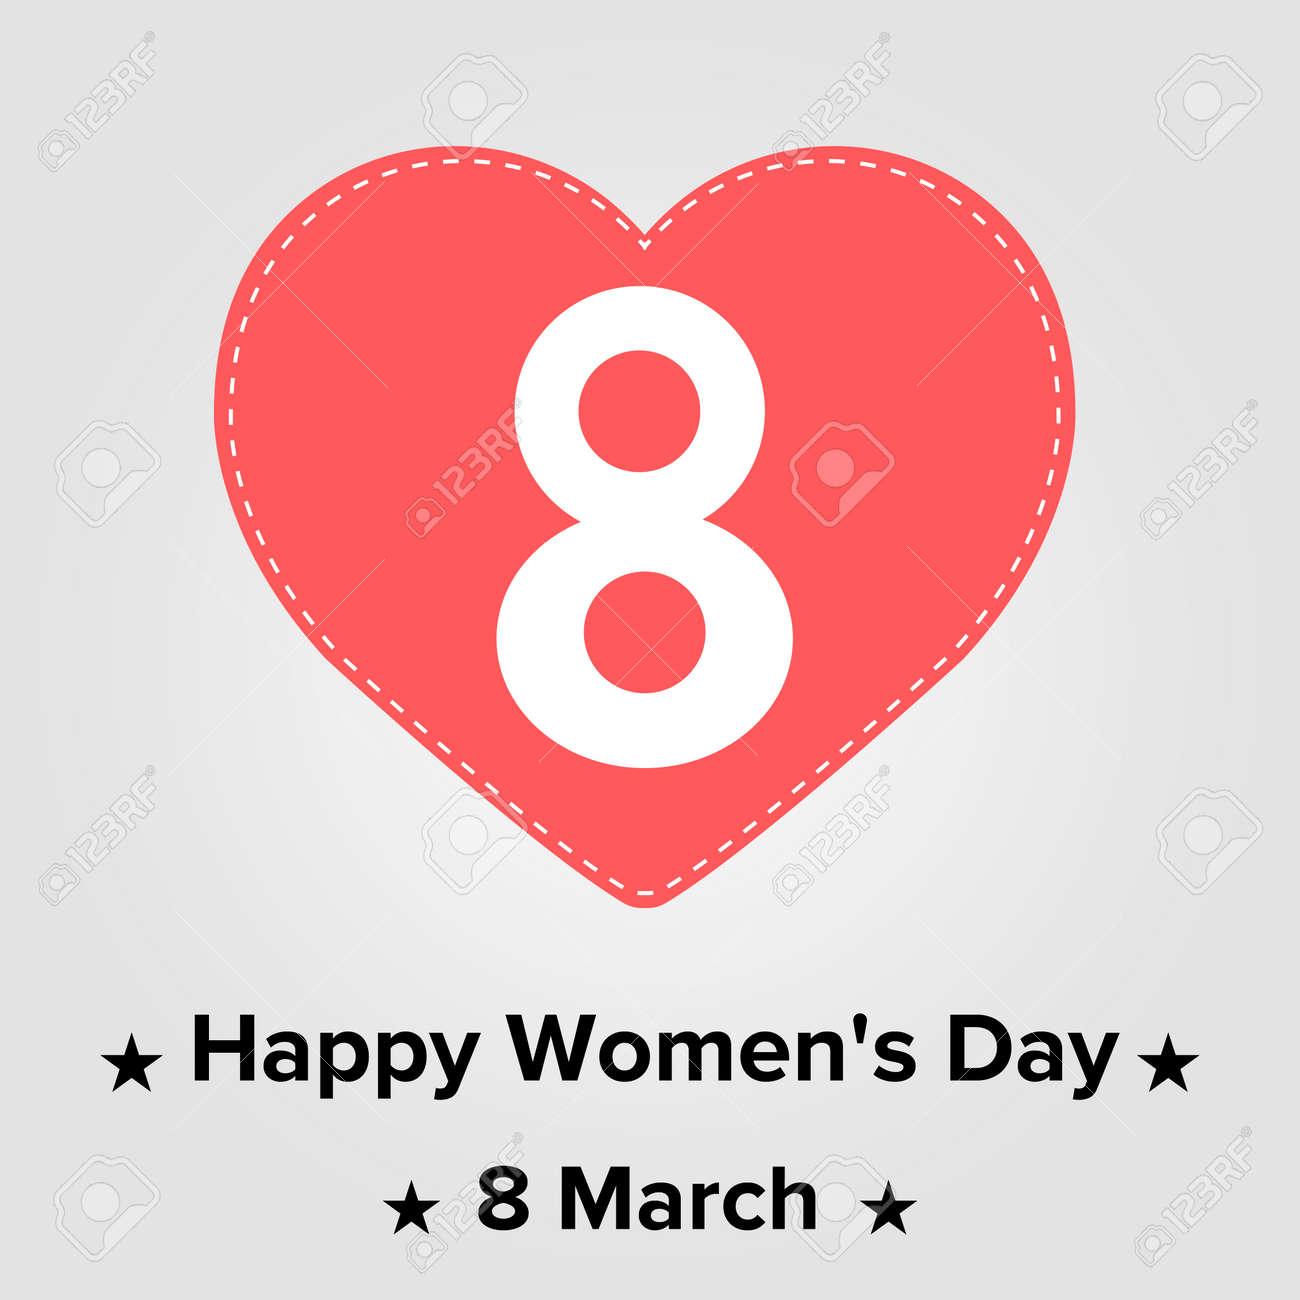 Hearts Symbols Happy Womens Day 8 March Royalty Free Cliparts